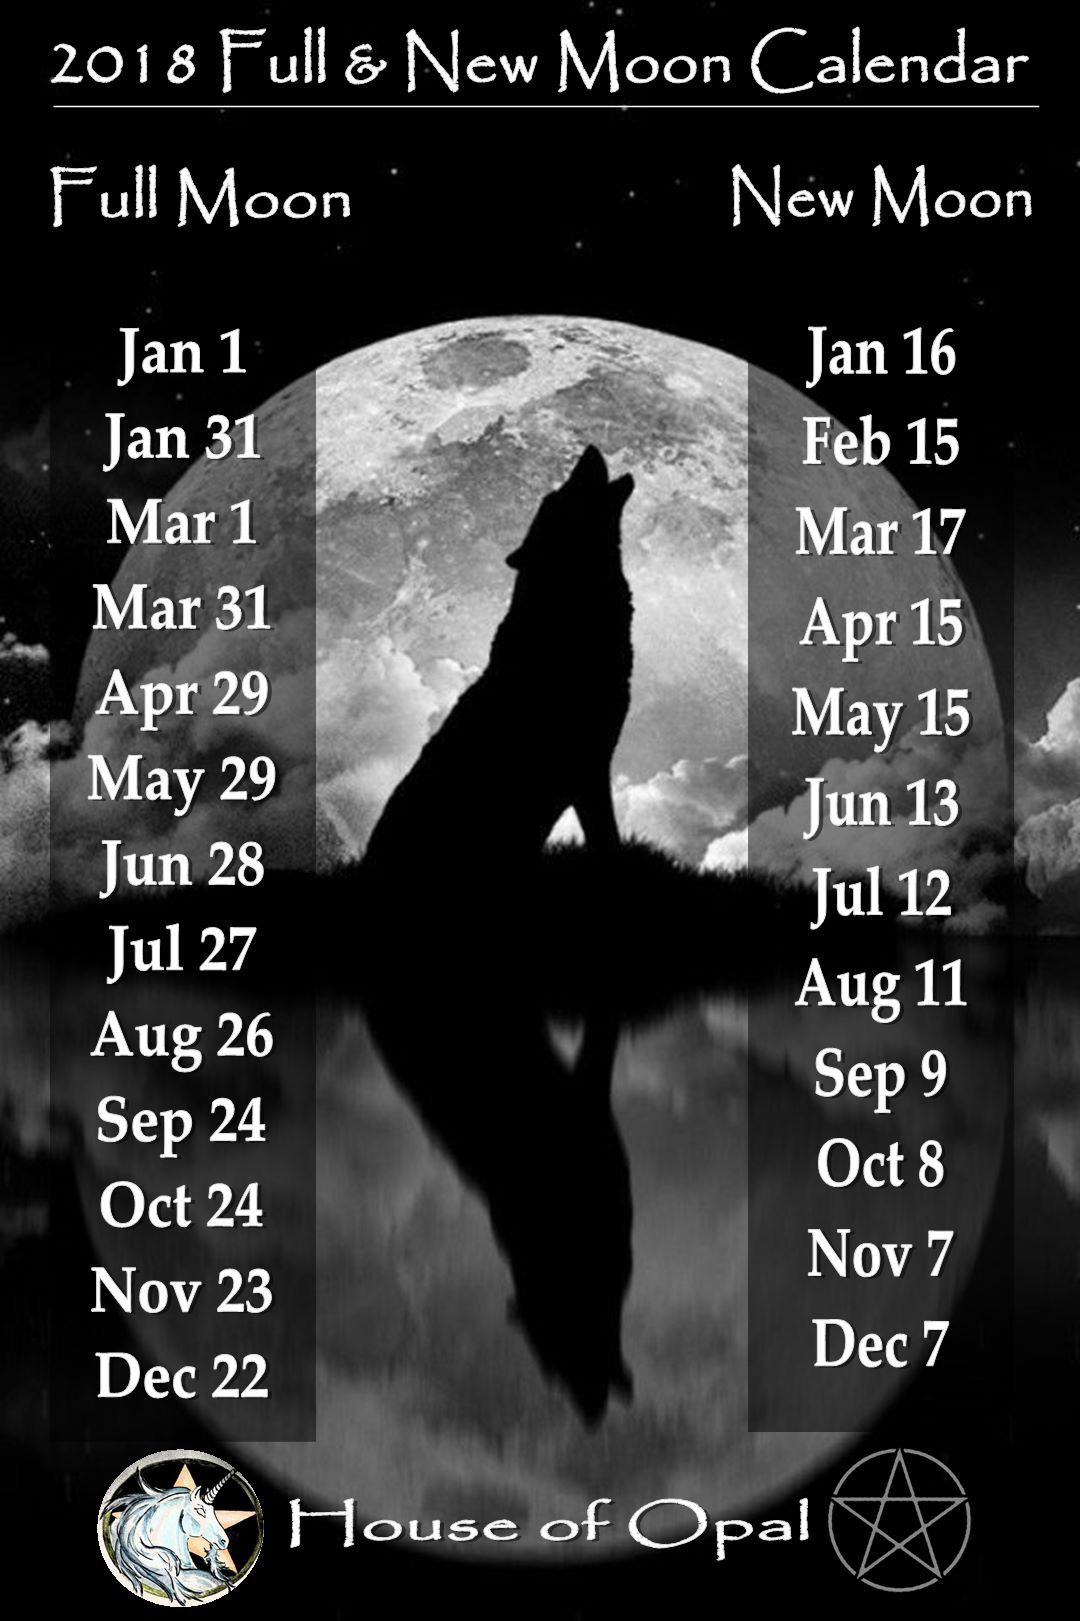 2018 Full & New Moon Calendar | moon | Pinterest | Moon ...